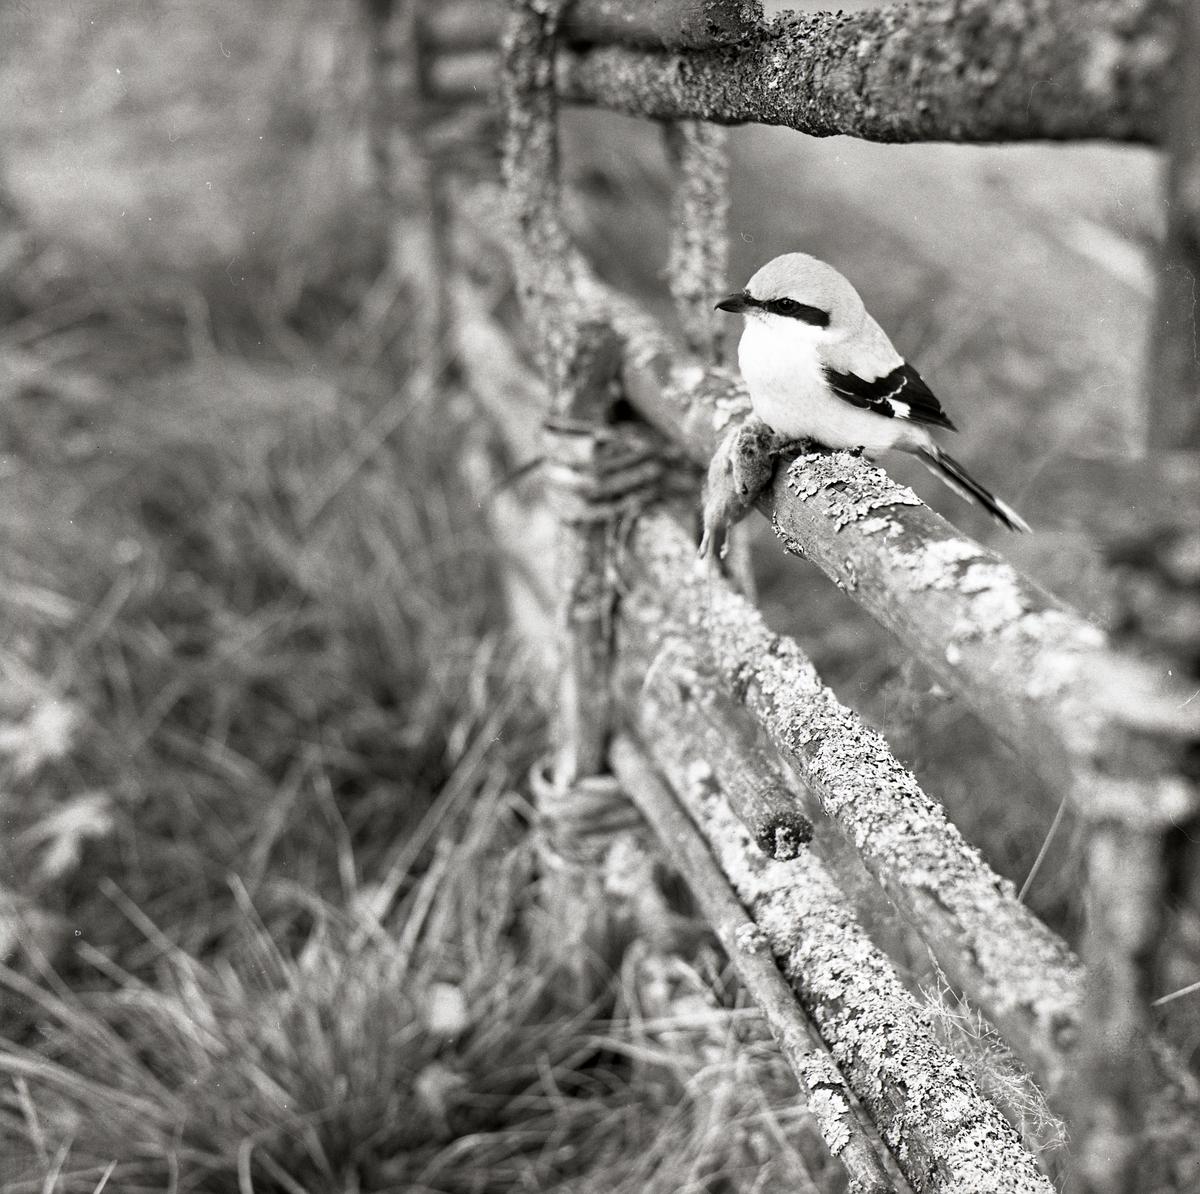 En varfågel sitter på ett staket, 1968.